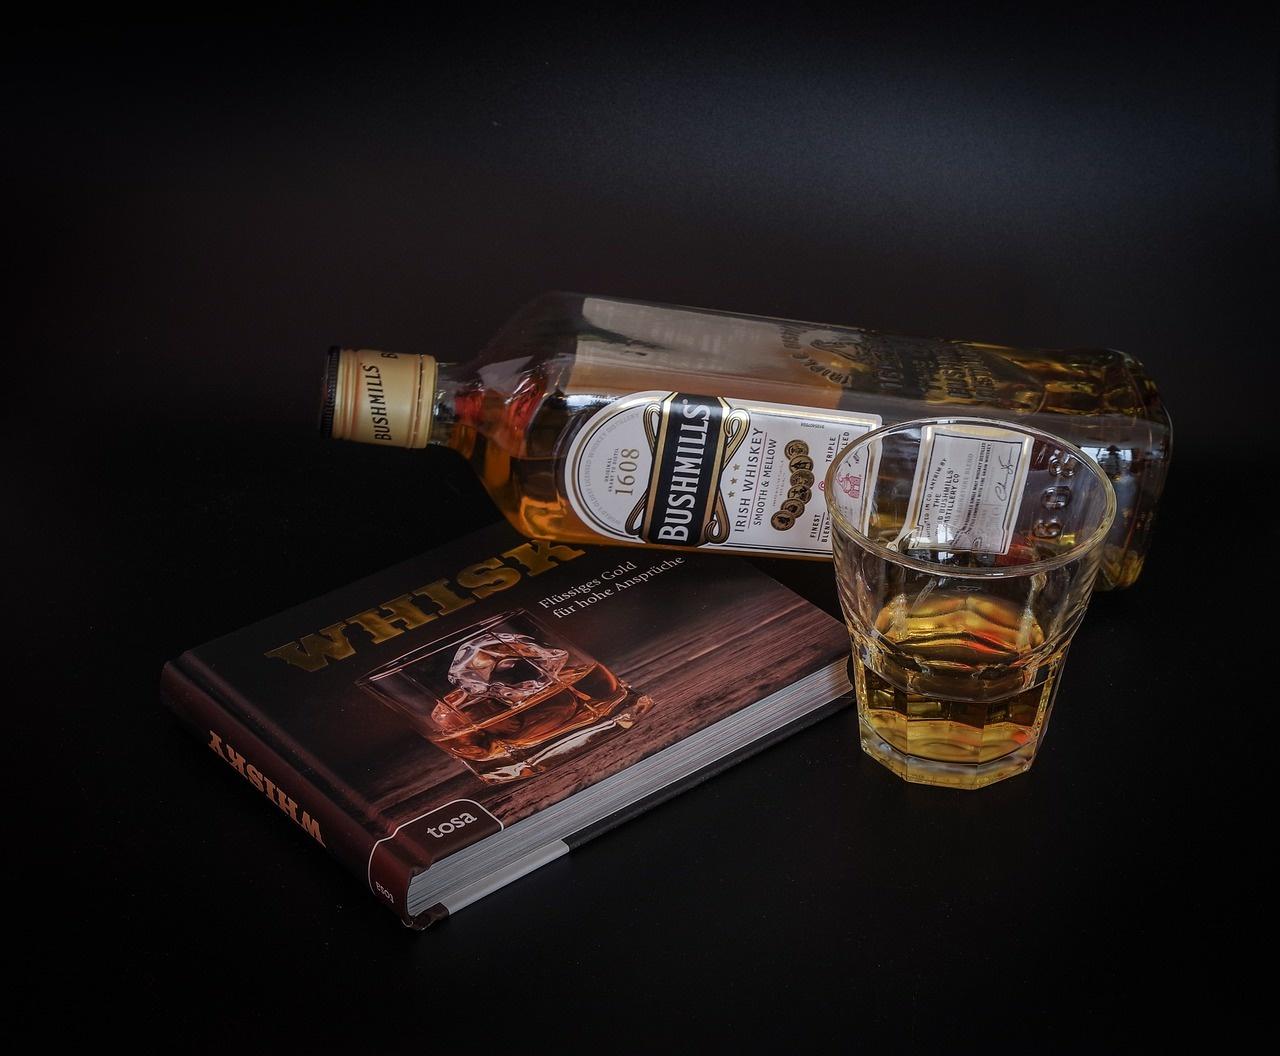 Iemand jarig? Doe een whisky cadeau